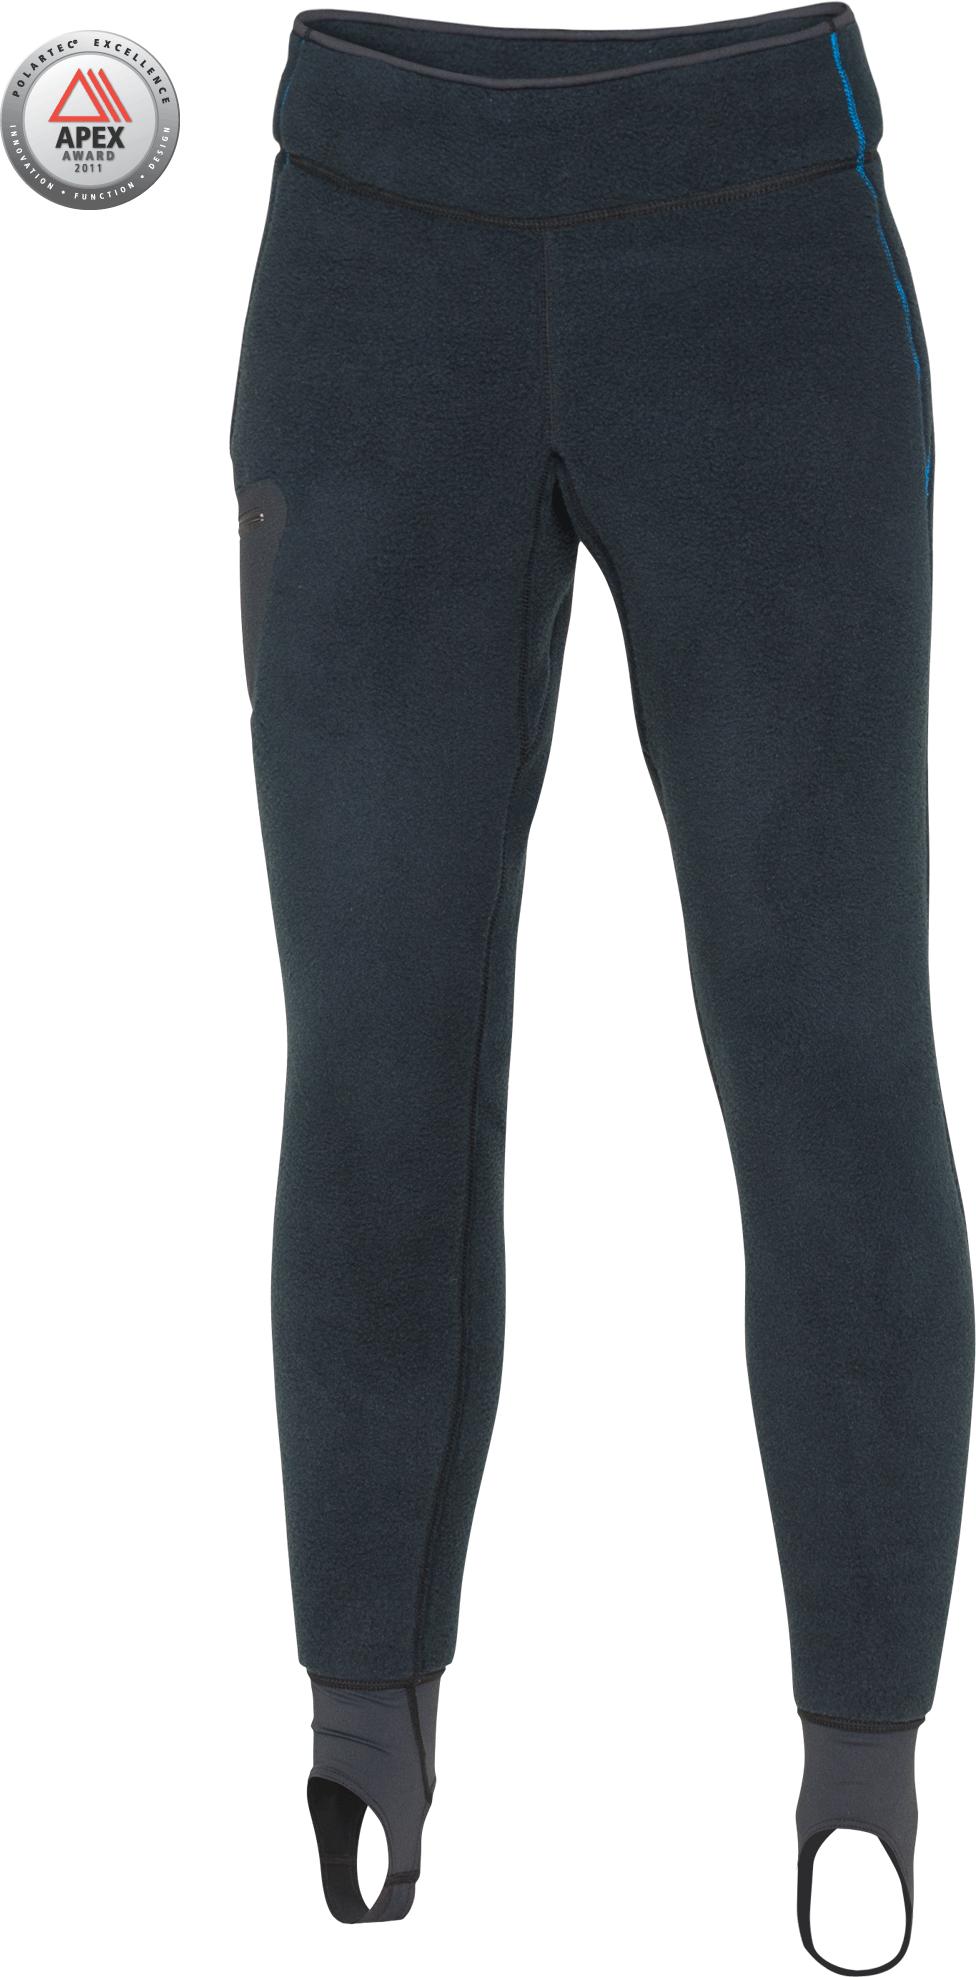 SB System Mid Layer Pant - Women